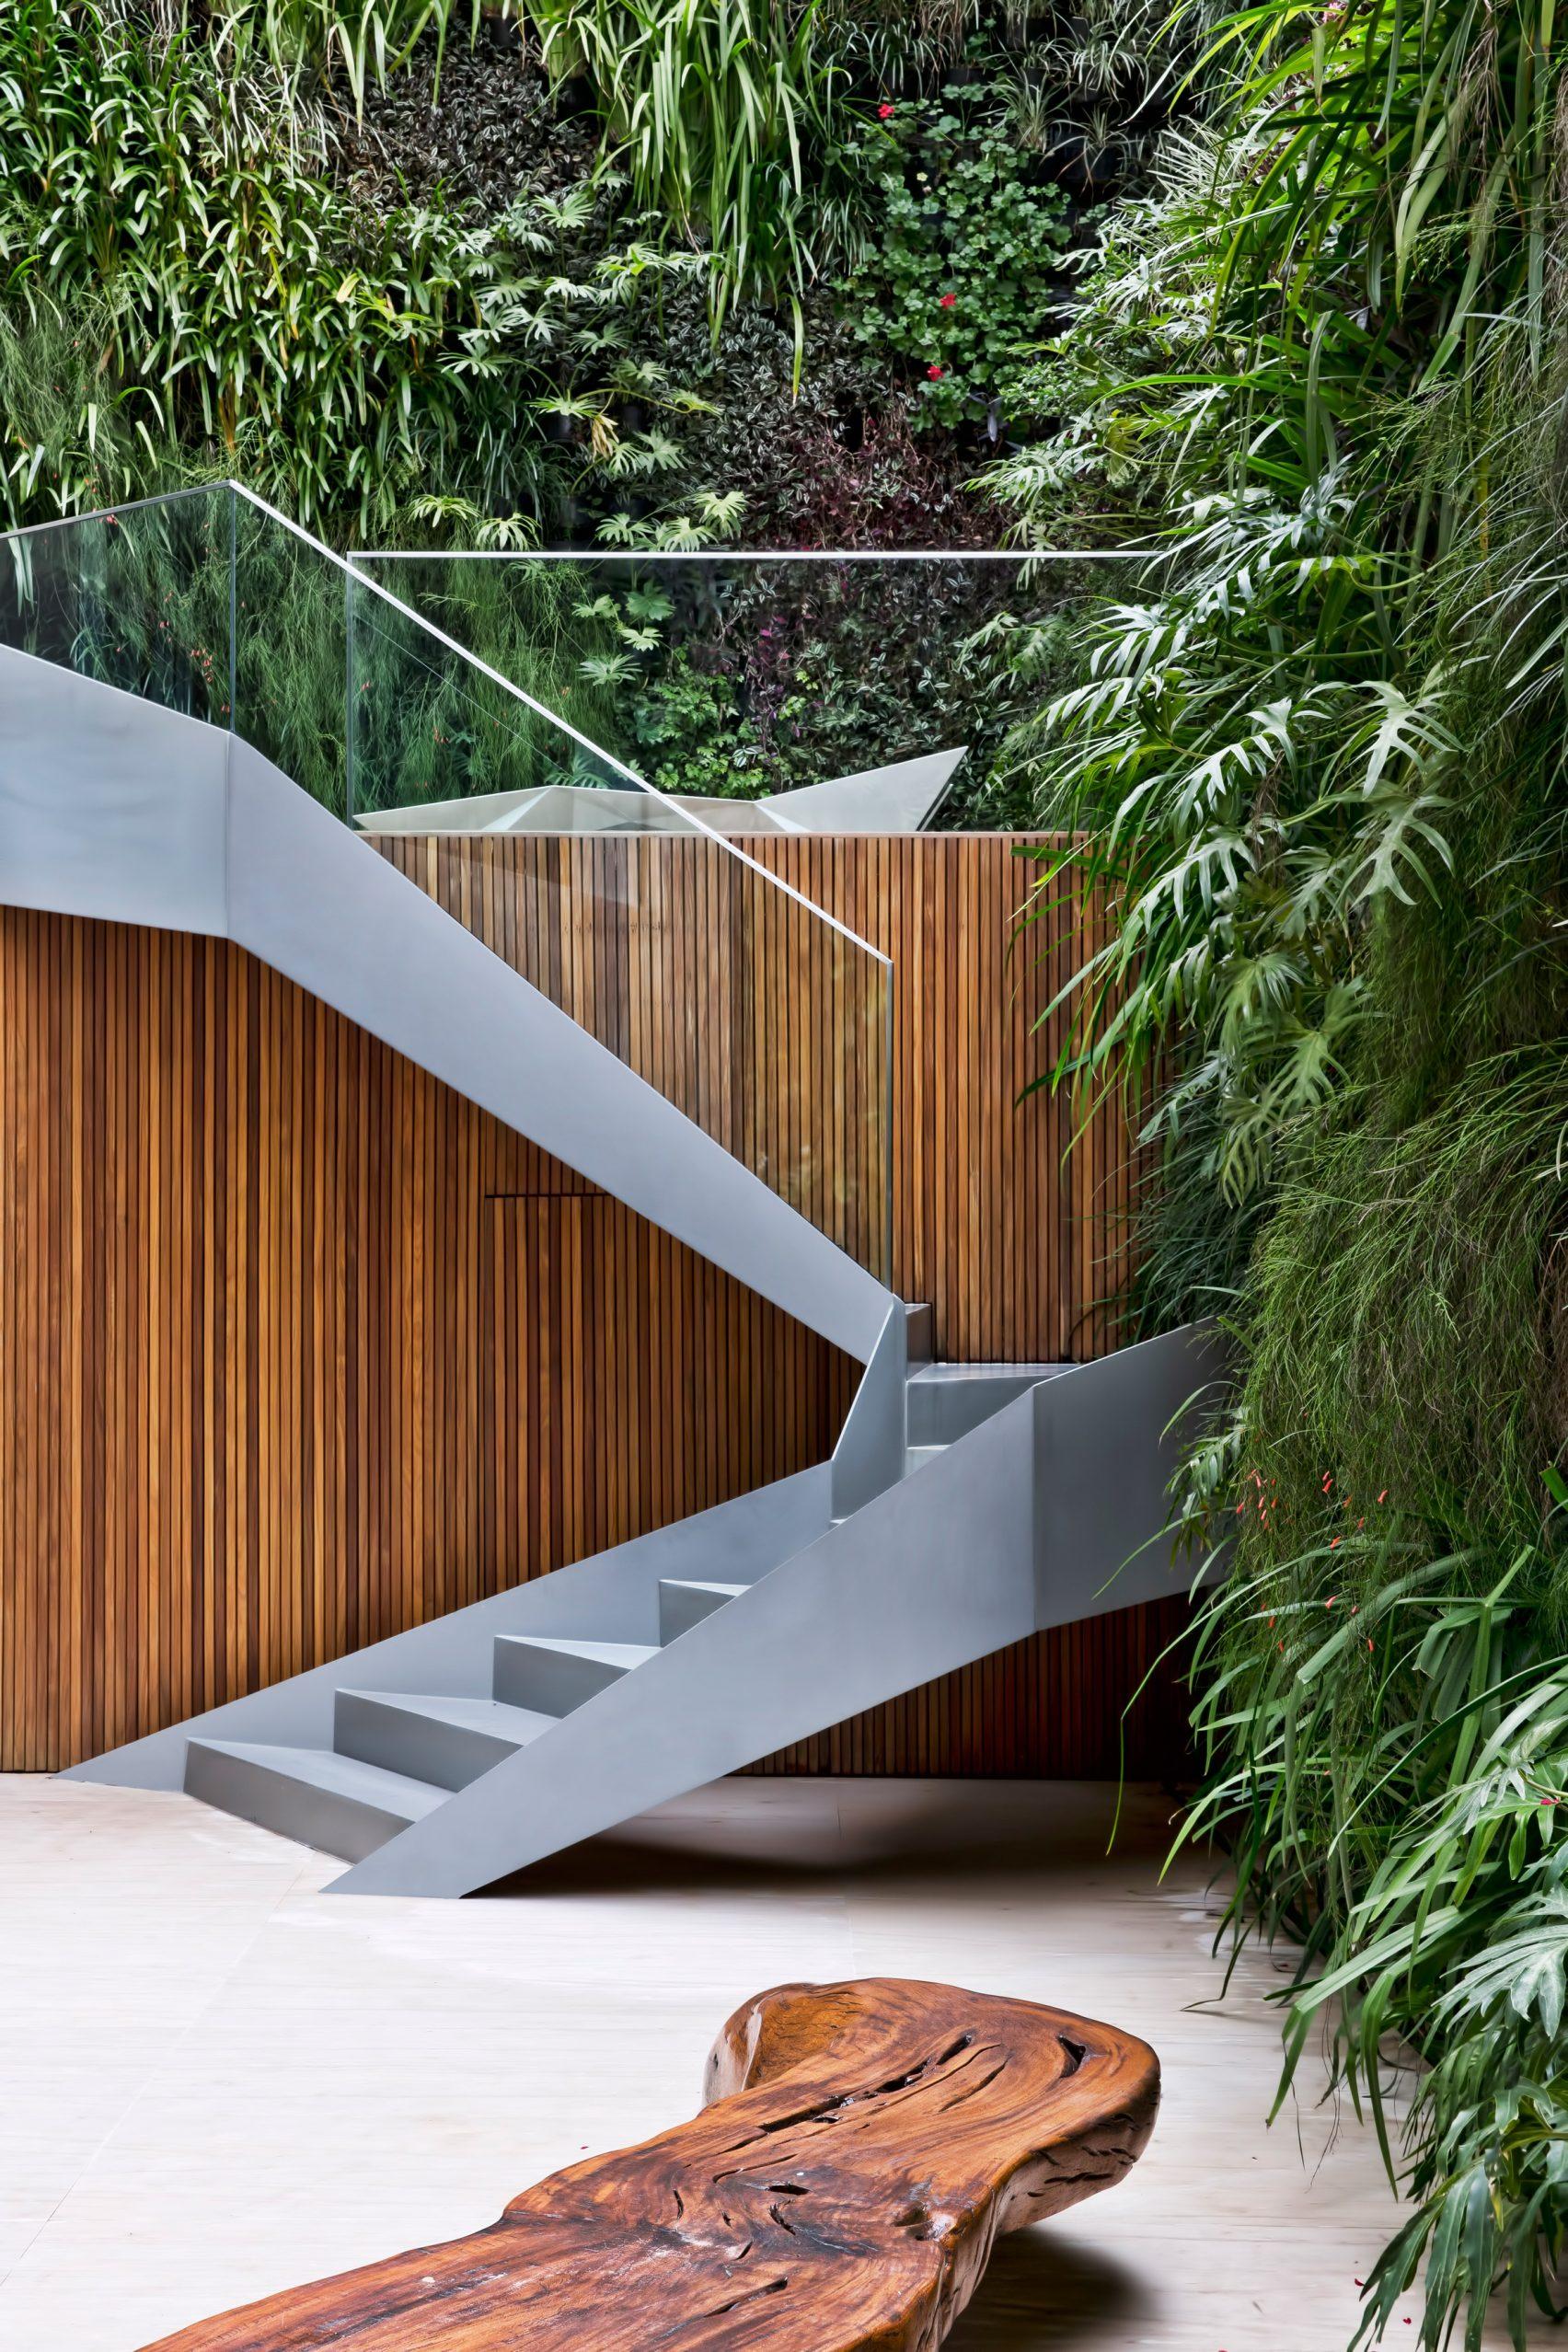 jardim-vertical-quadro-vivo-de-plantas-por-fernanda-marques